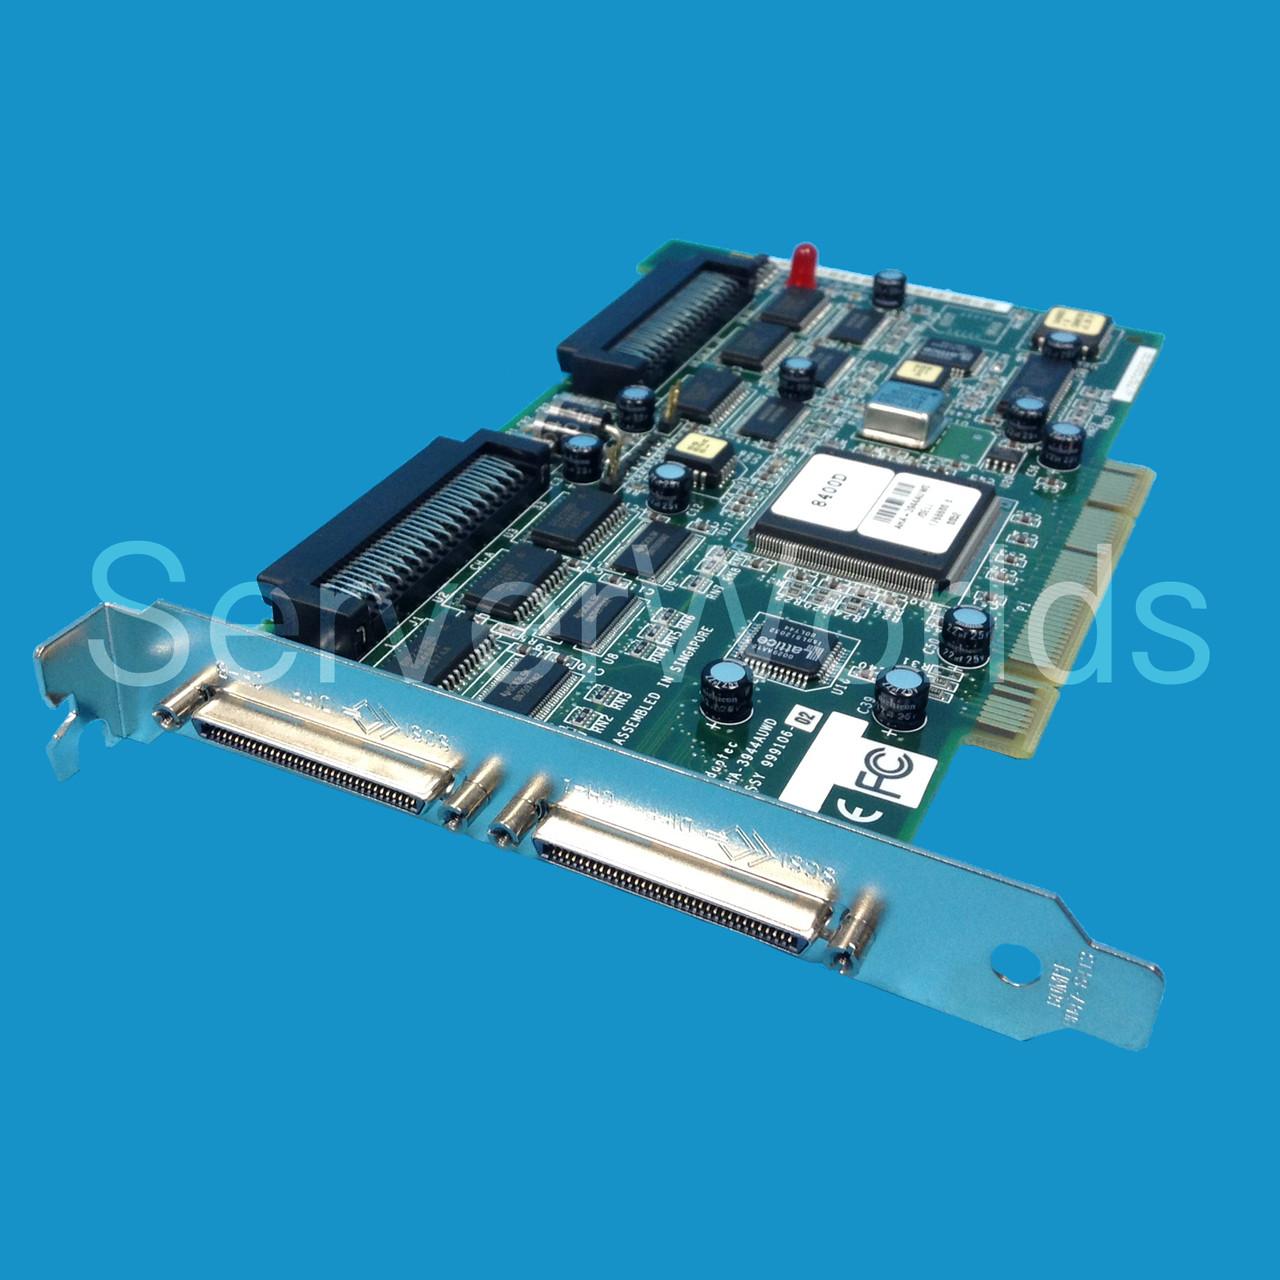 Adaptec AHA-3944 PCI SCSI Controller Windows 7